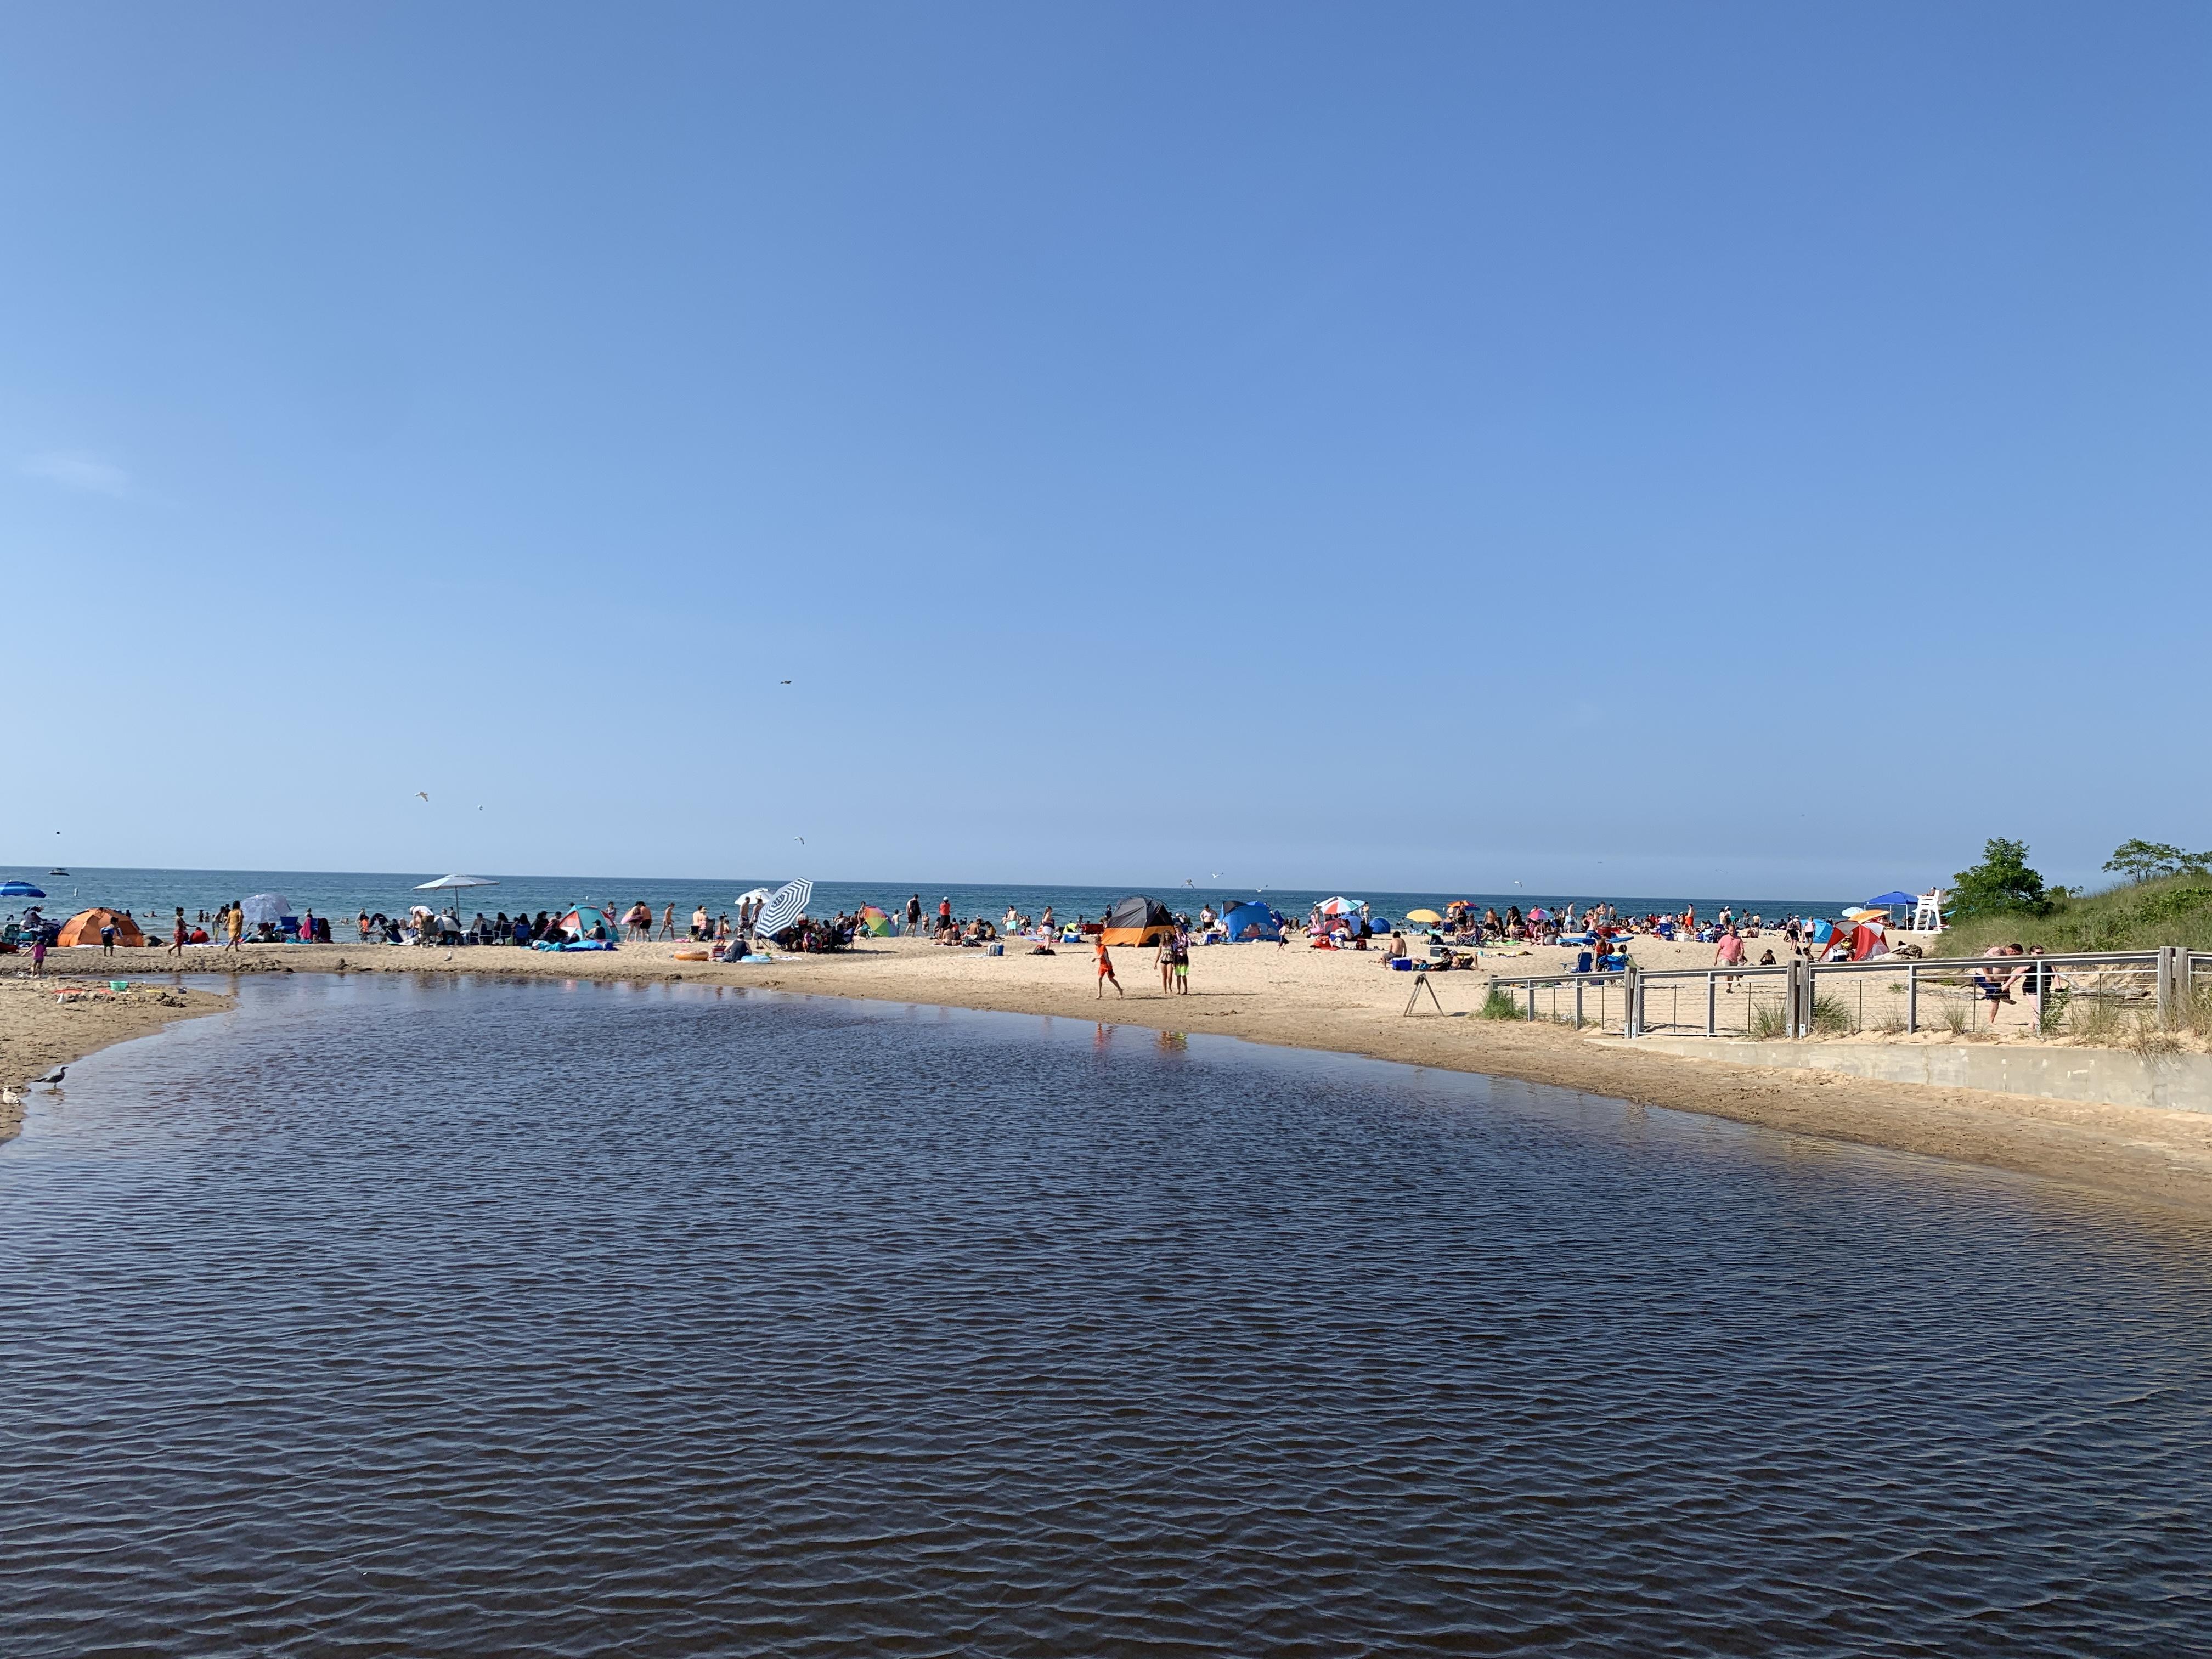 Indiana Dunes Beach on Lake Michigan